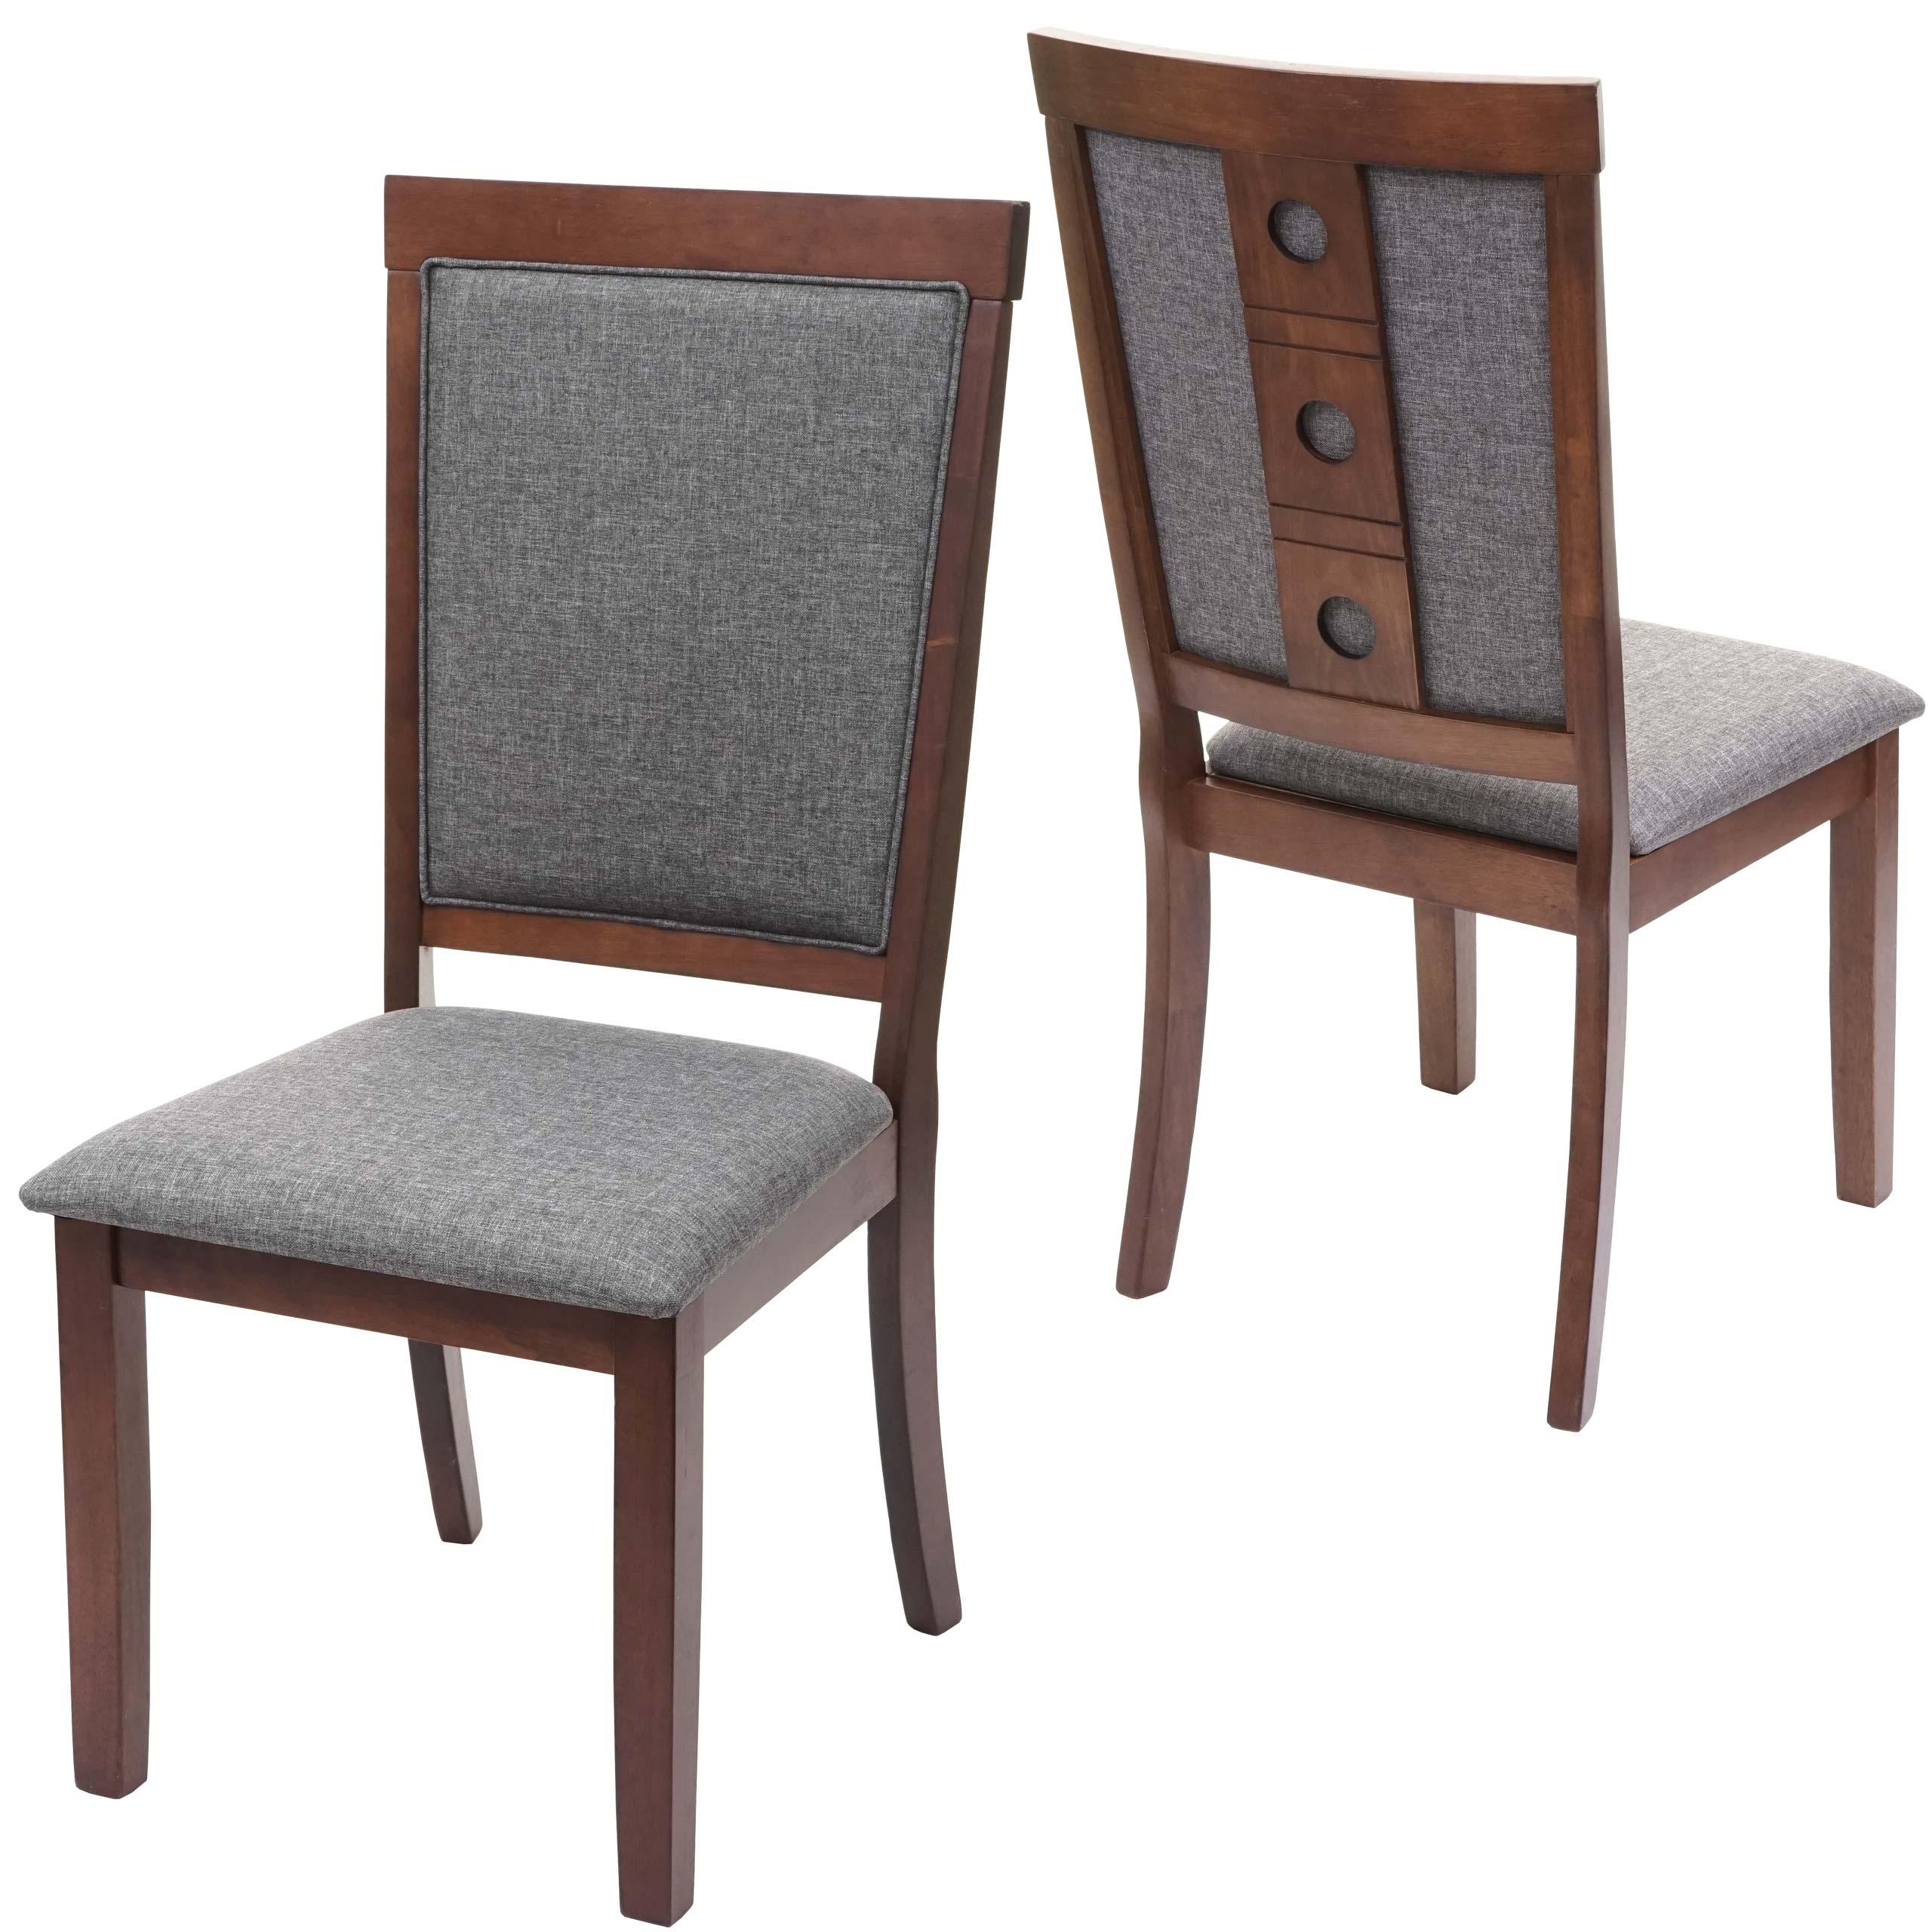 2x Esszimmerstuhl Hwc G61 Kuchenstuhl Lehnstuhl Stuhl Stoff Textil Massiv Holz Dunkles Gestell Grau